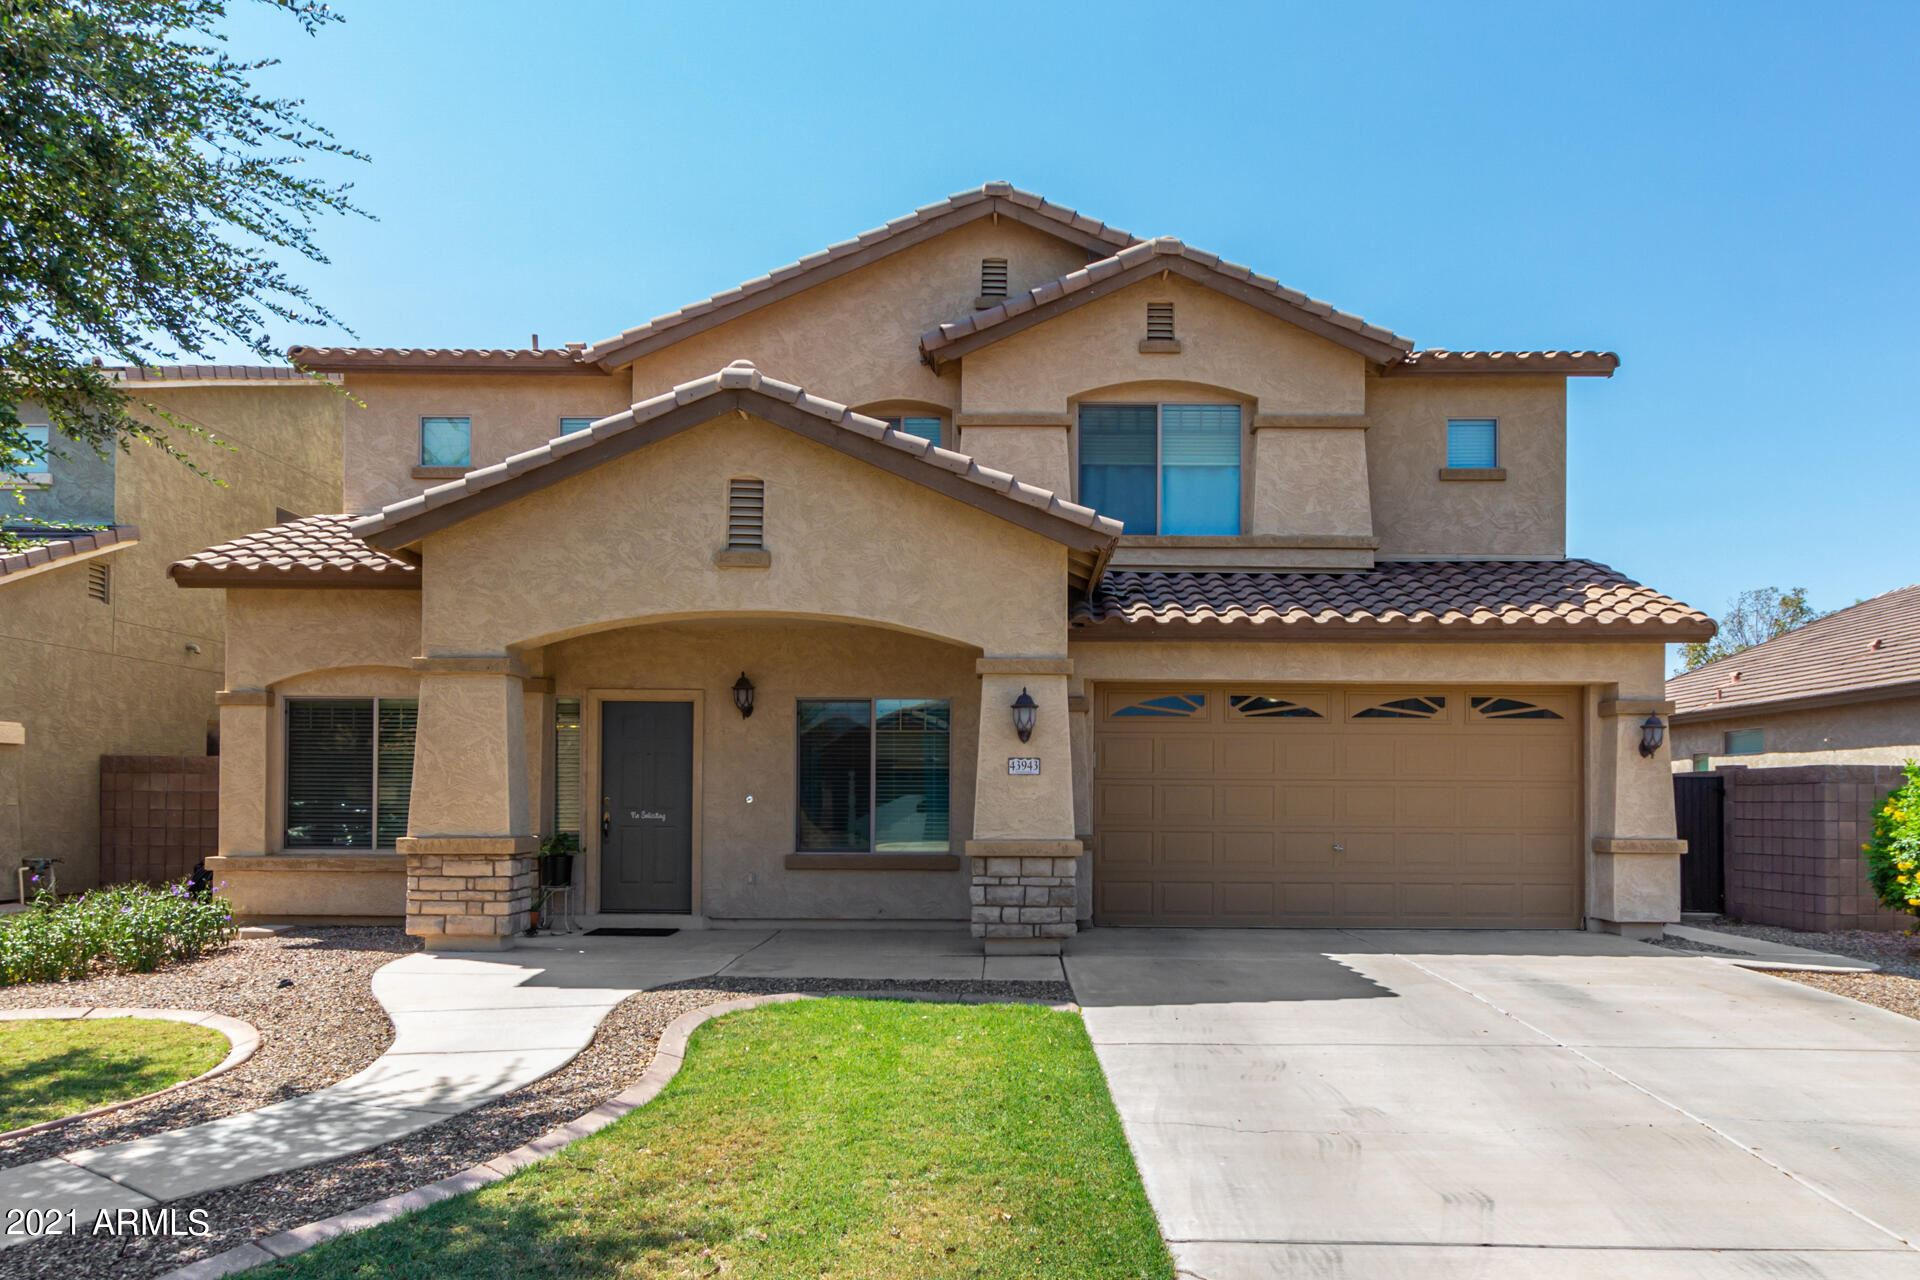 Photo for 43943 W ADOBE Circle, Maricopa, AZ 85139 (MLS # 6290529)